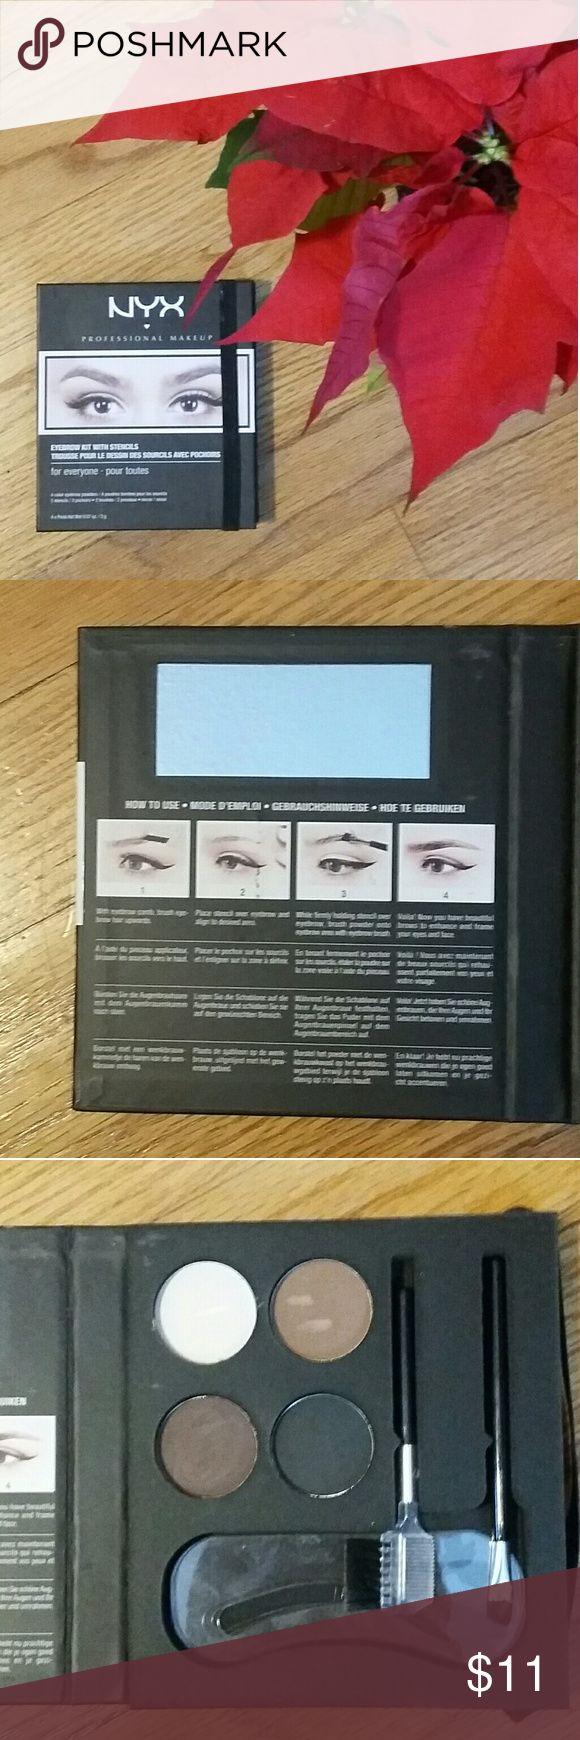 NYX Professional Makeup Eyebrow Kit with Stencils NYX